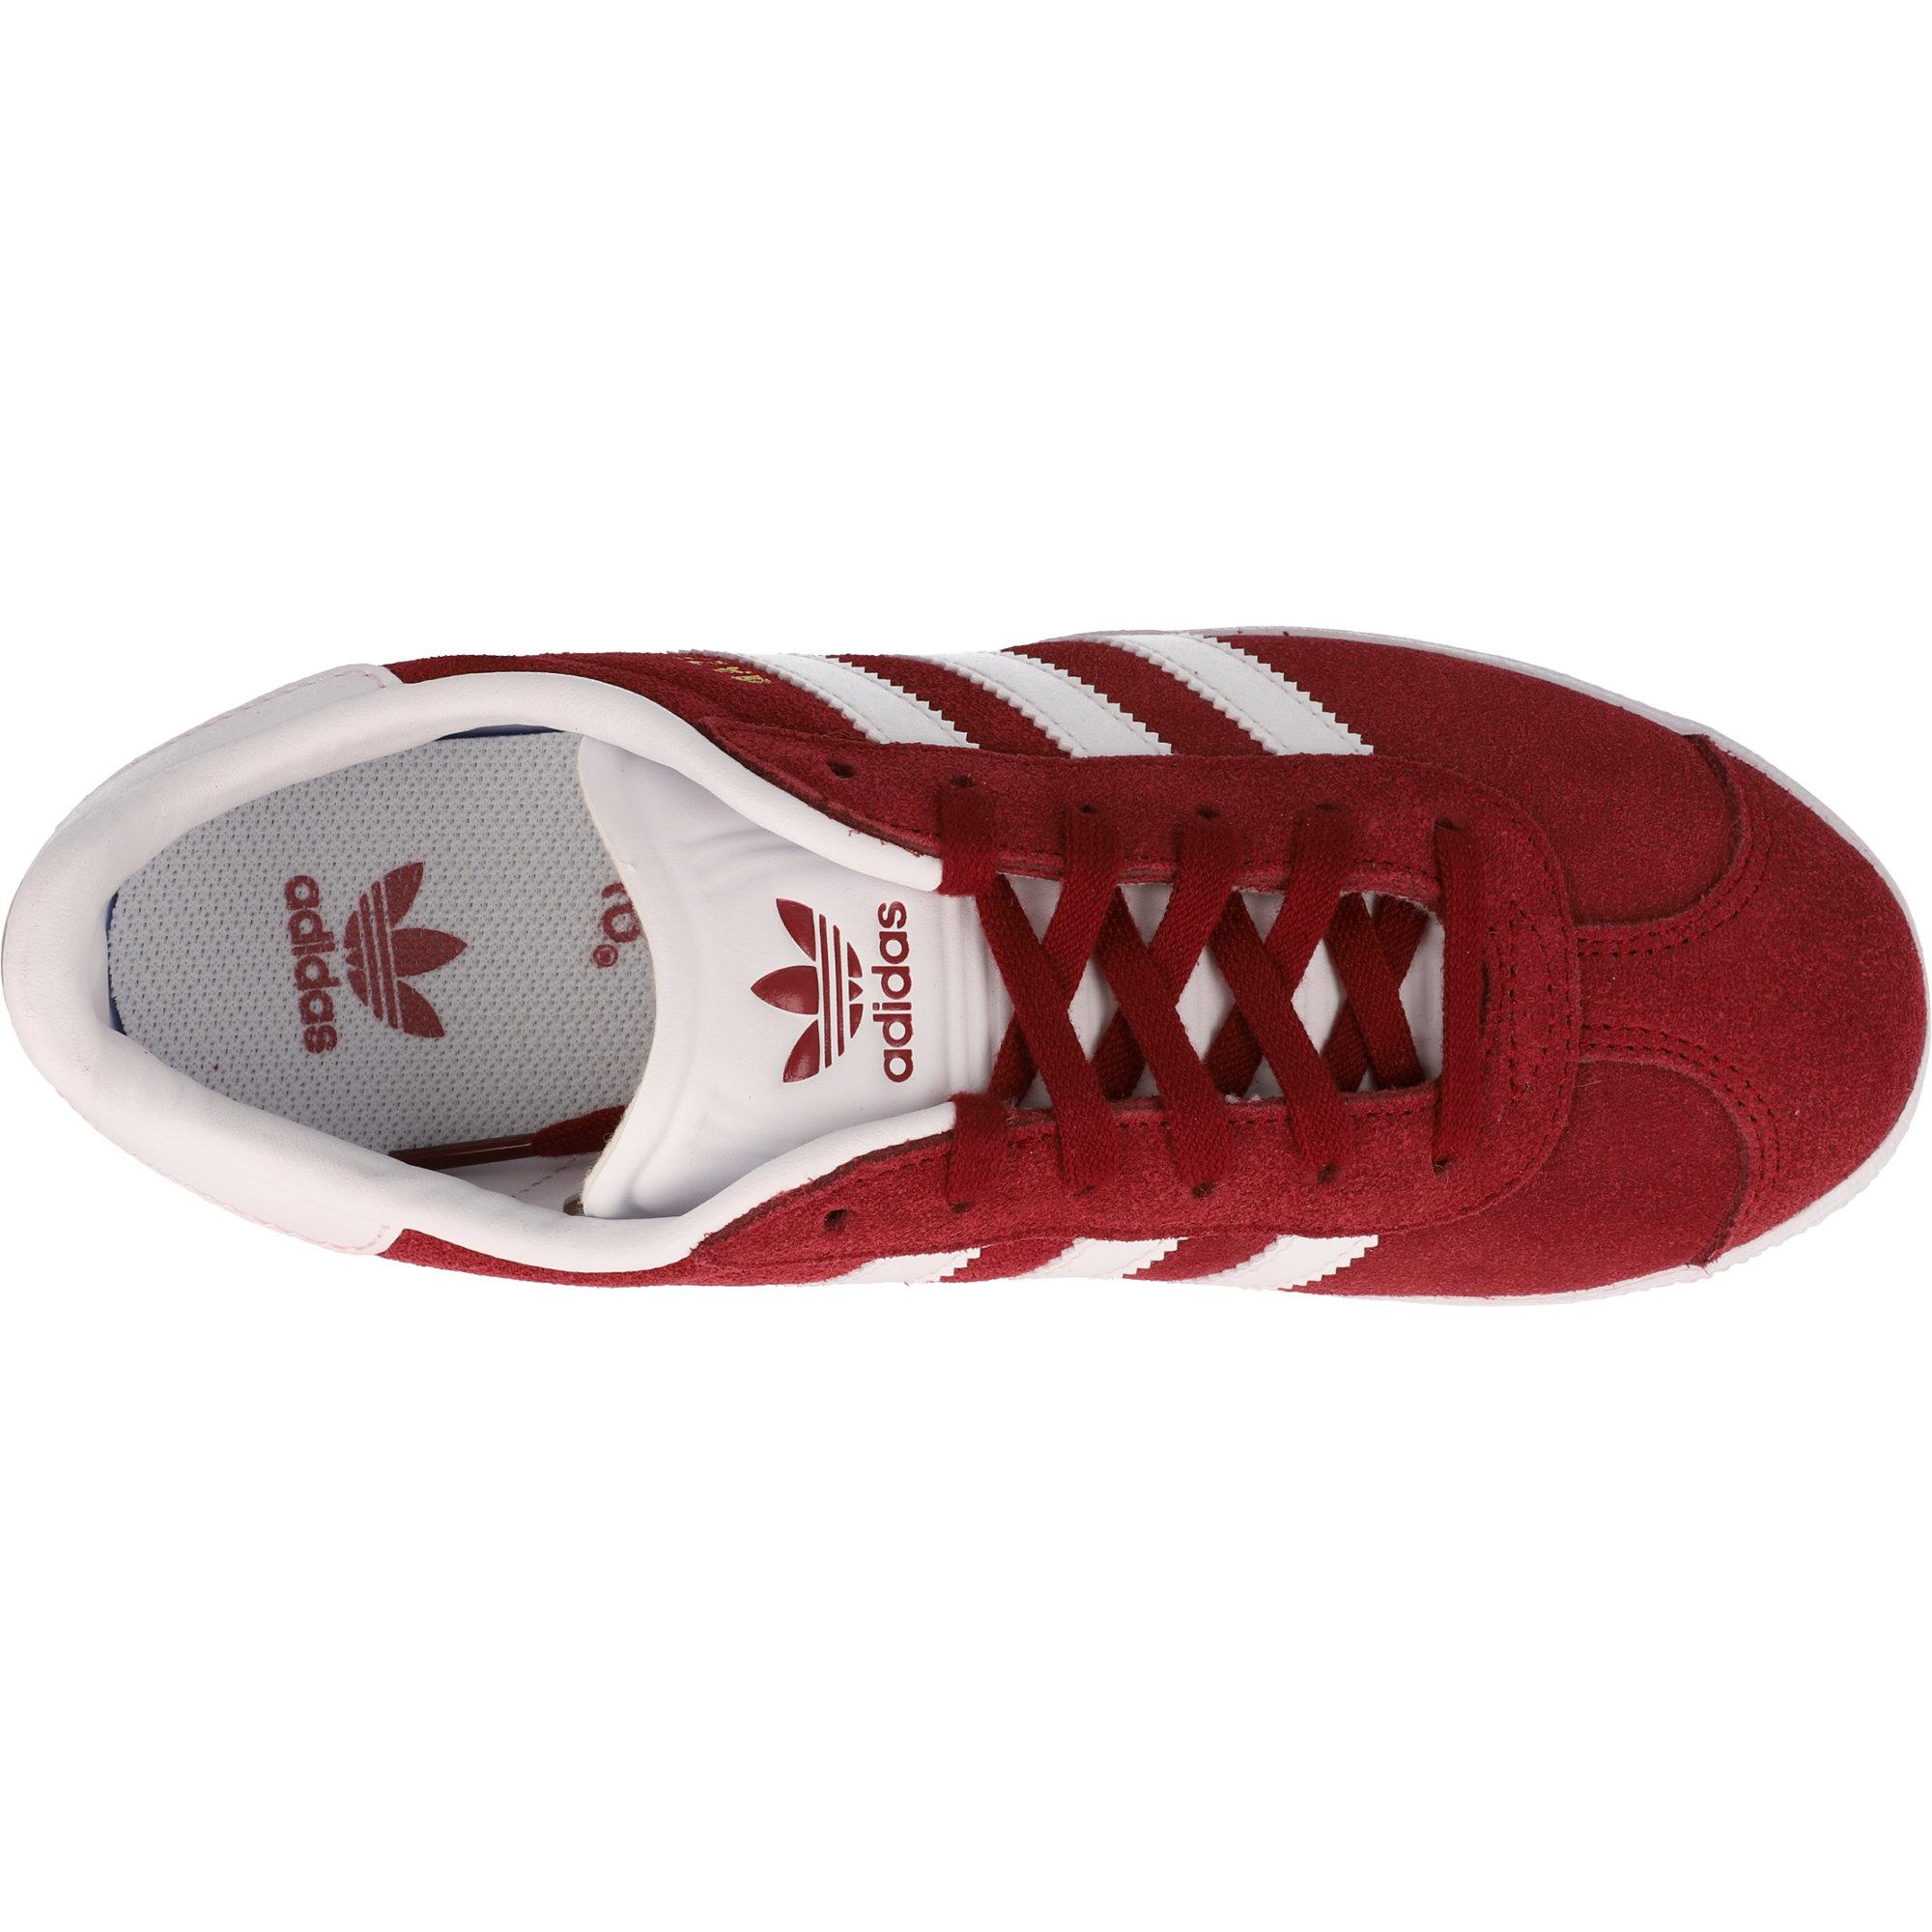 adidas gazelle burgundy junior